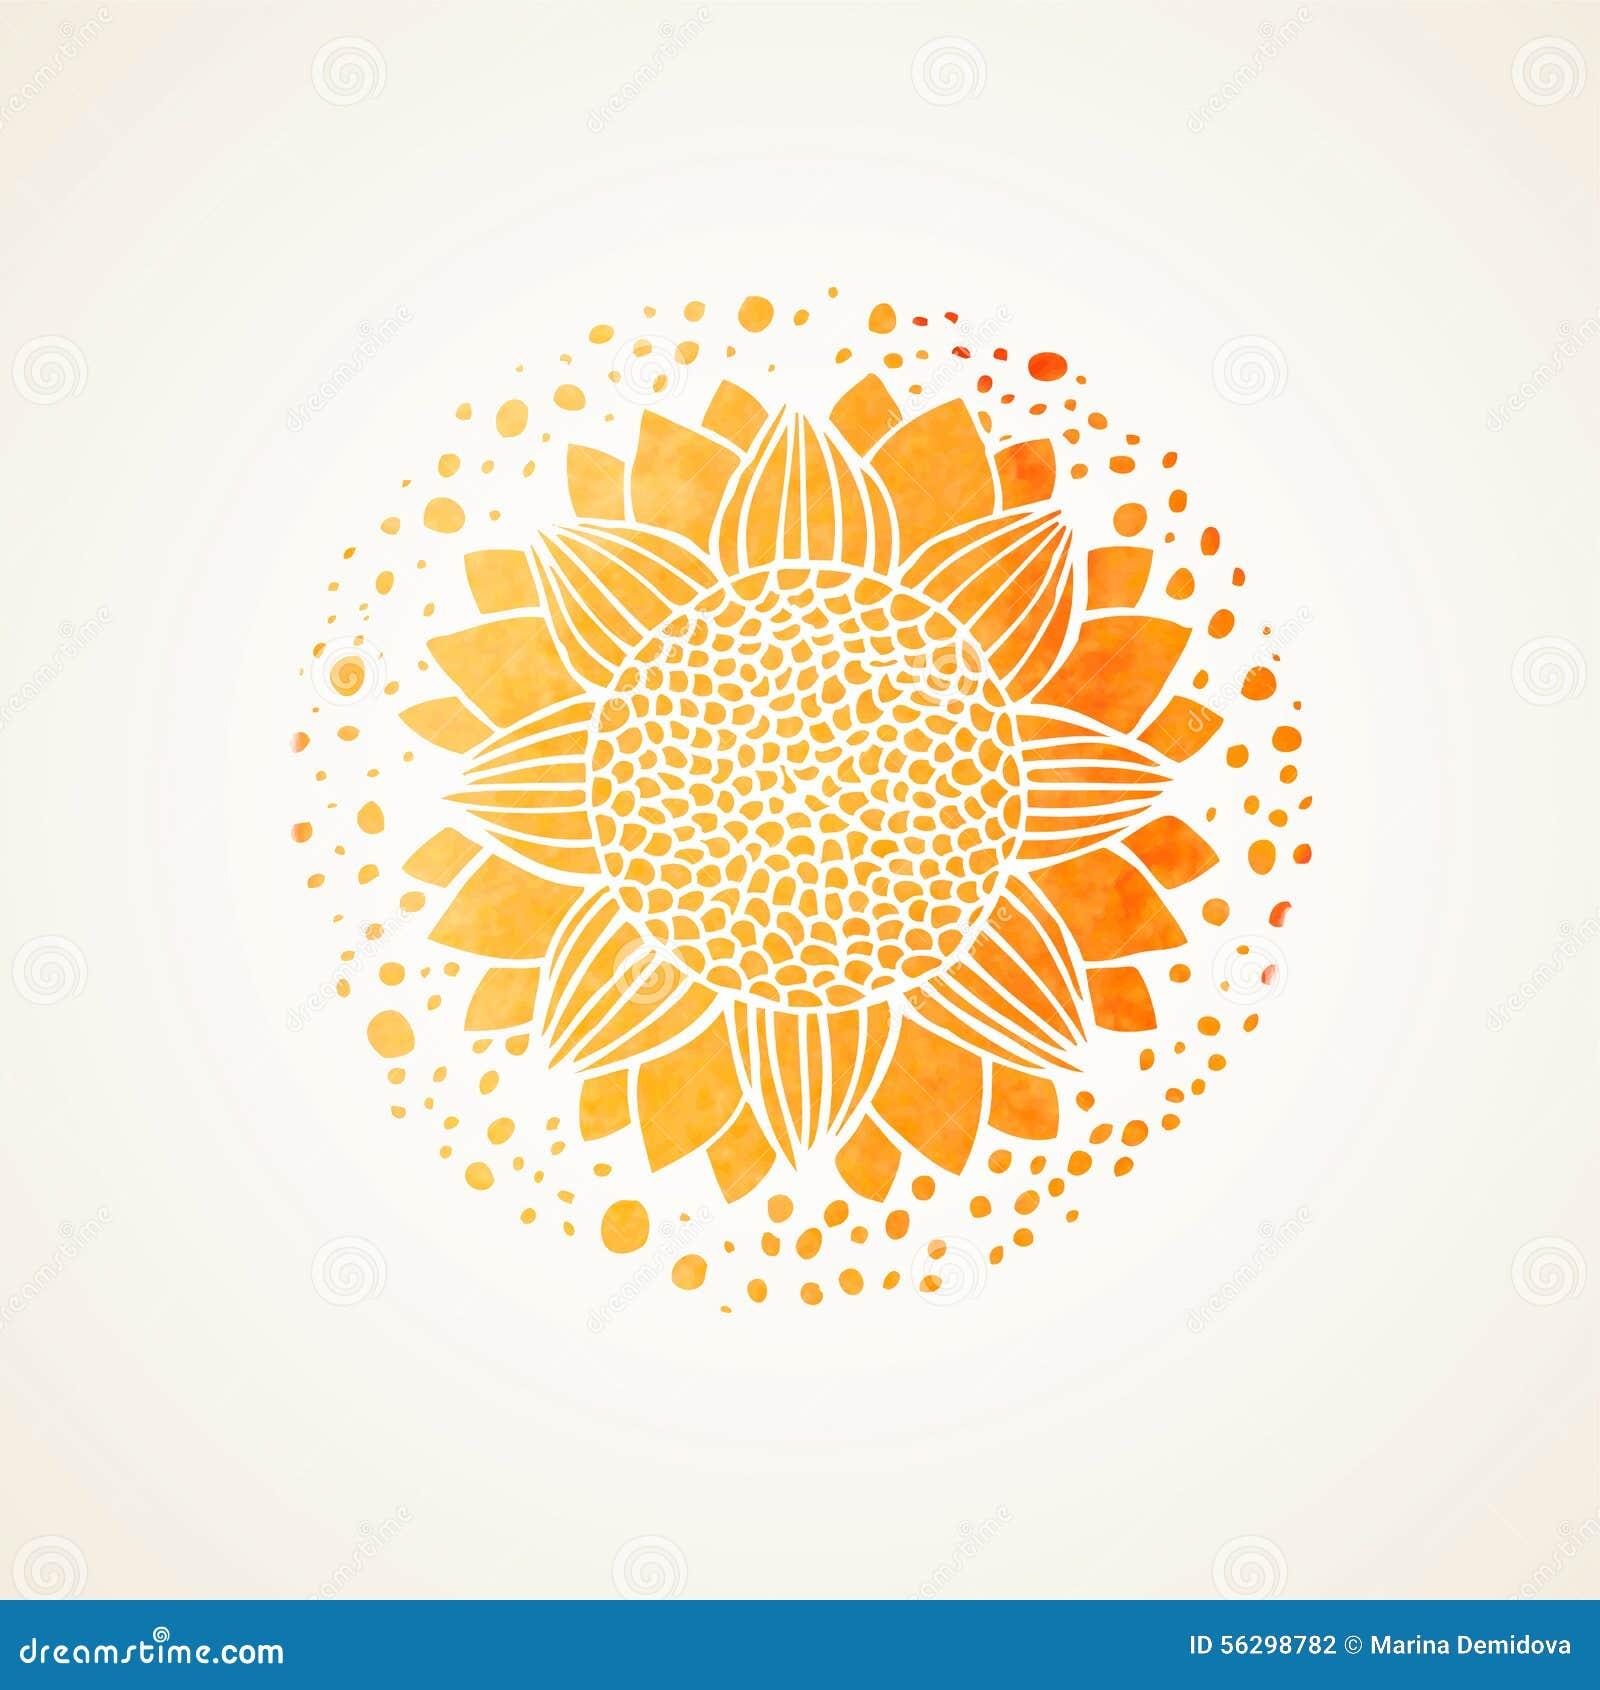 Patroon van het waterverf het zonnige gele kant Vector element mandala